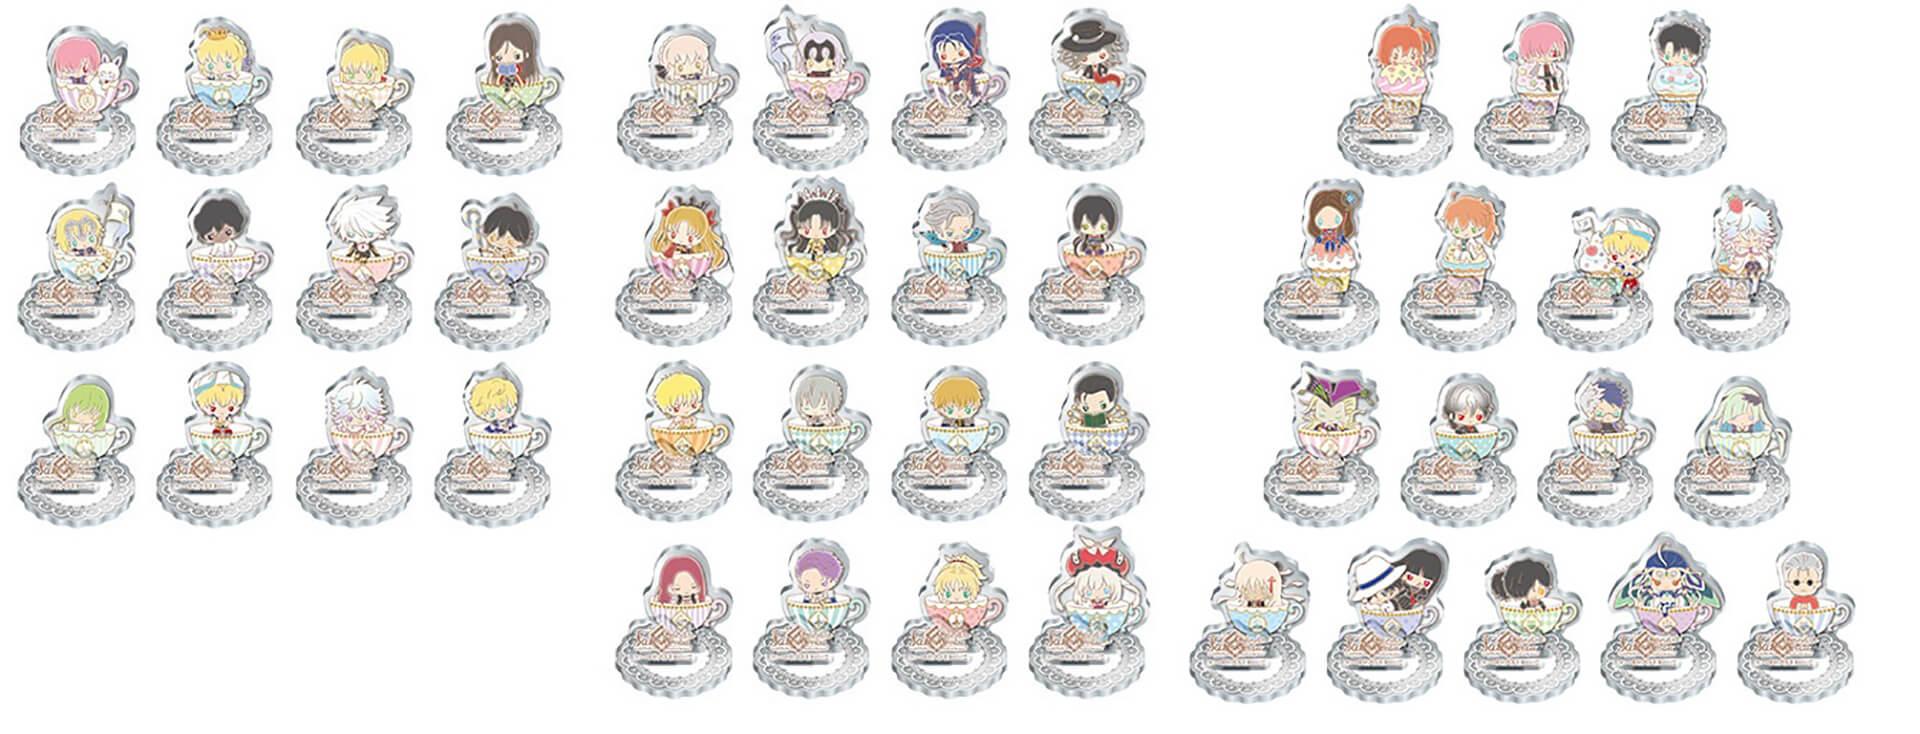 Fate/Grand Order Design produced by Sanrio カフェの物販キーホルダー